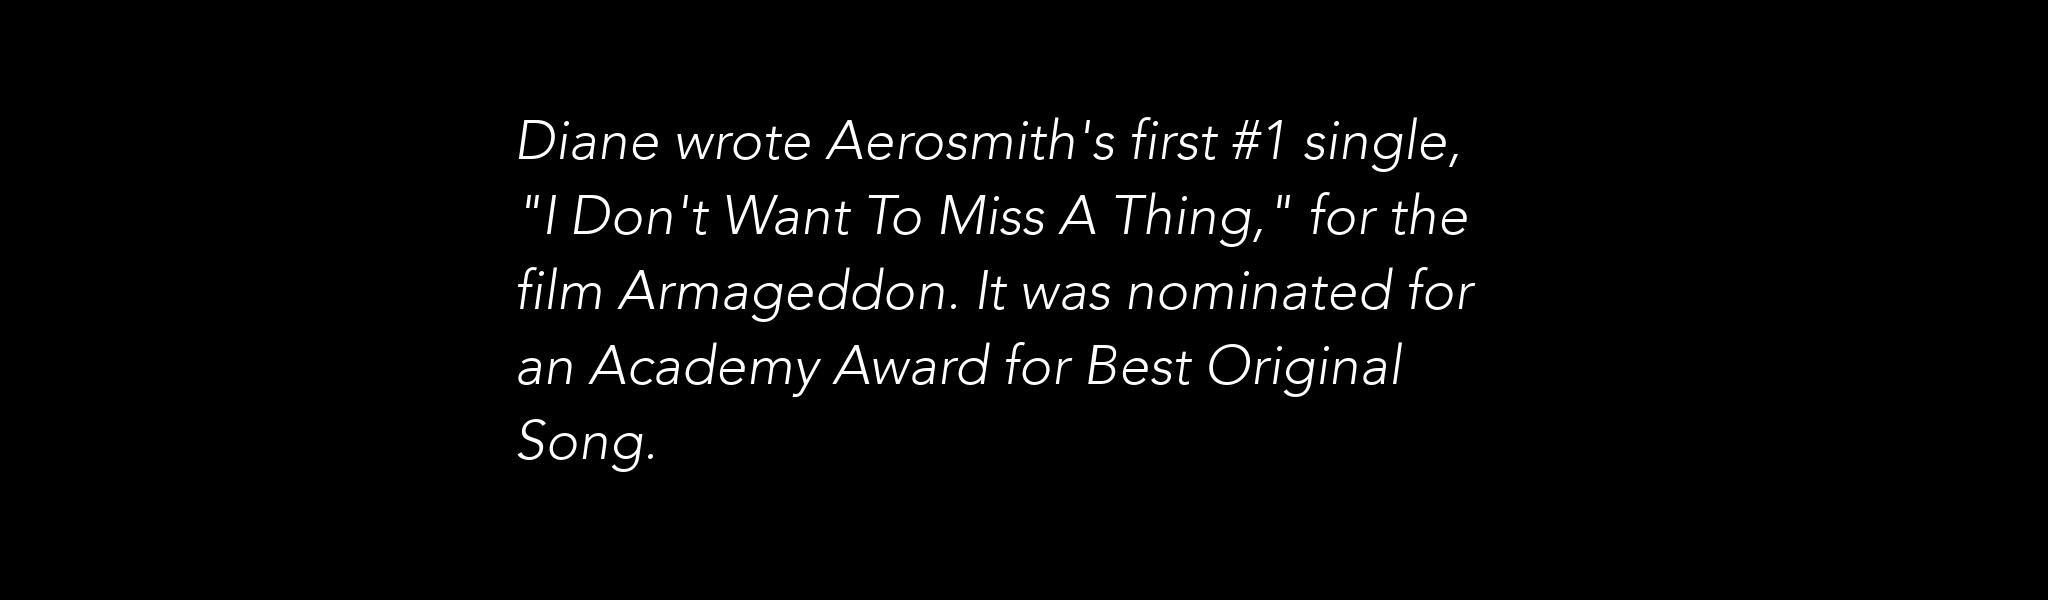 Aerosmith Fact Slider 1.1